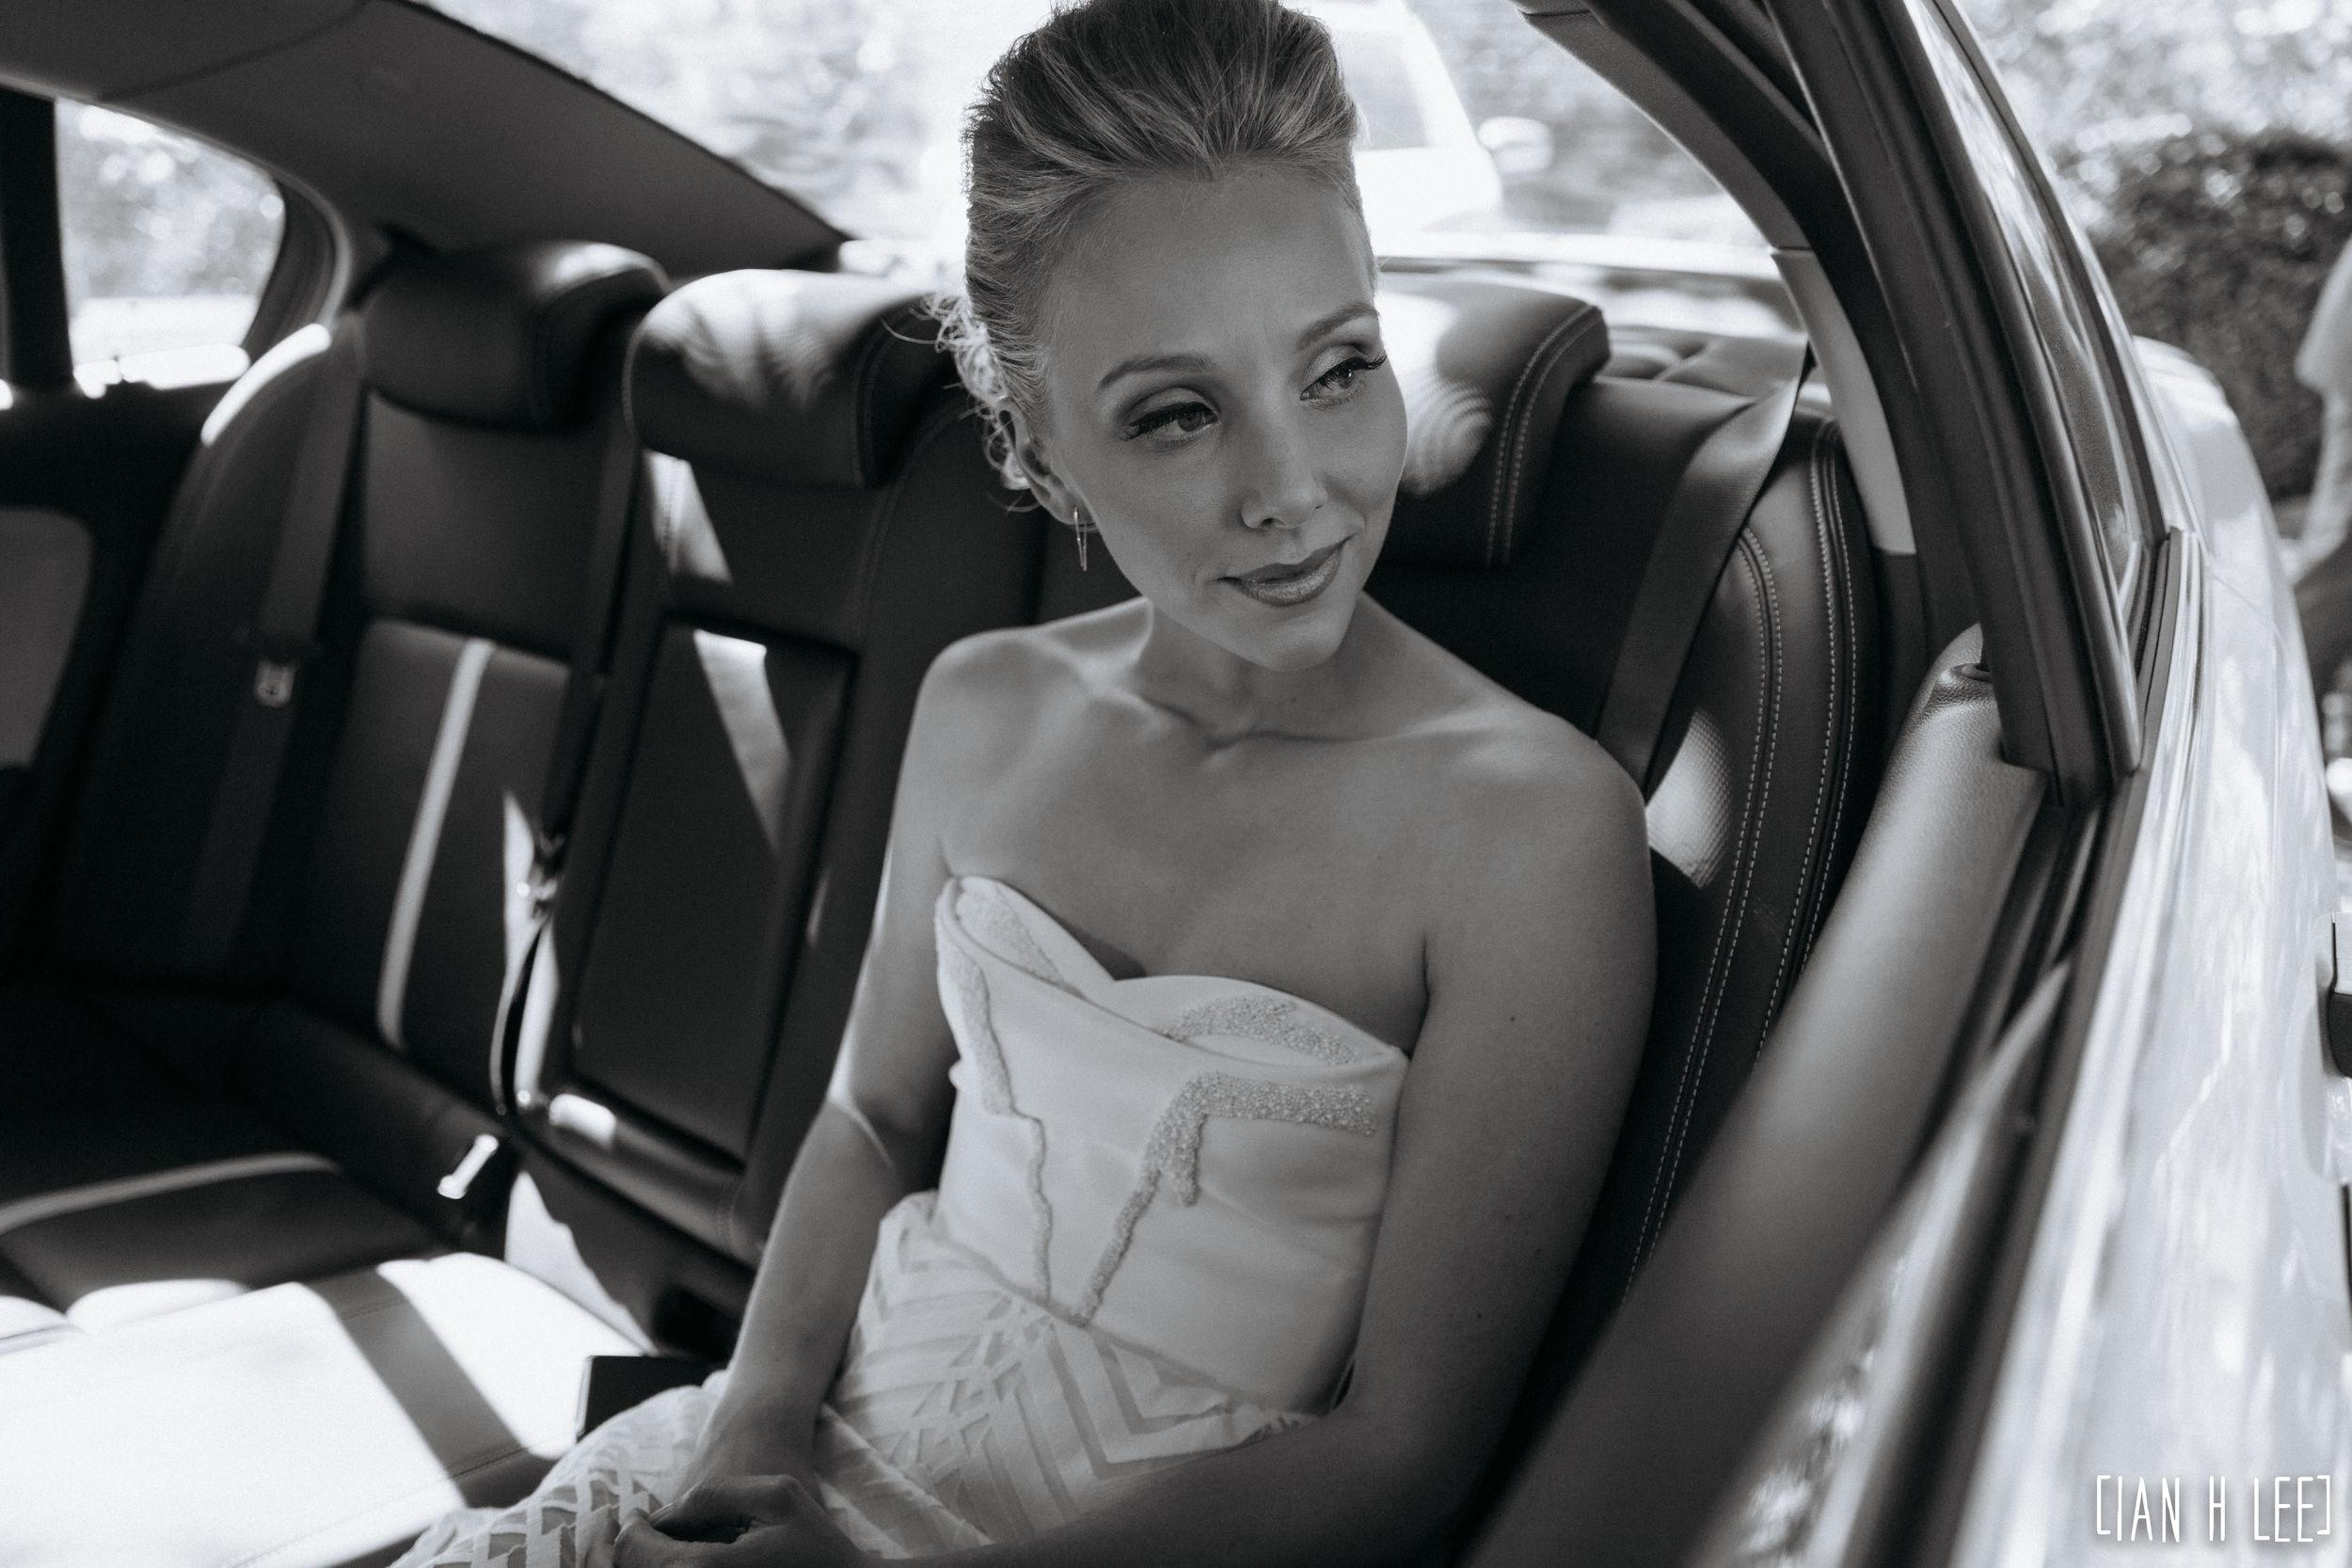 [Ian H Lee] Photography || Weddings - Melbourne || Ewan And Courtney -9301.jpg